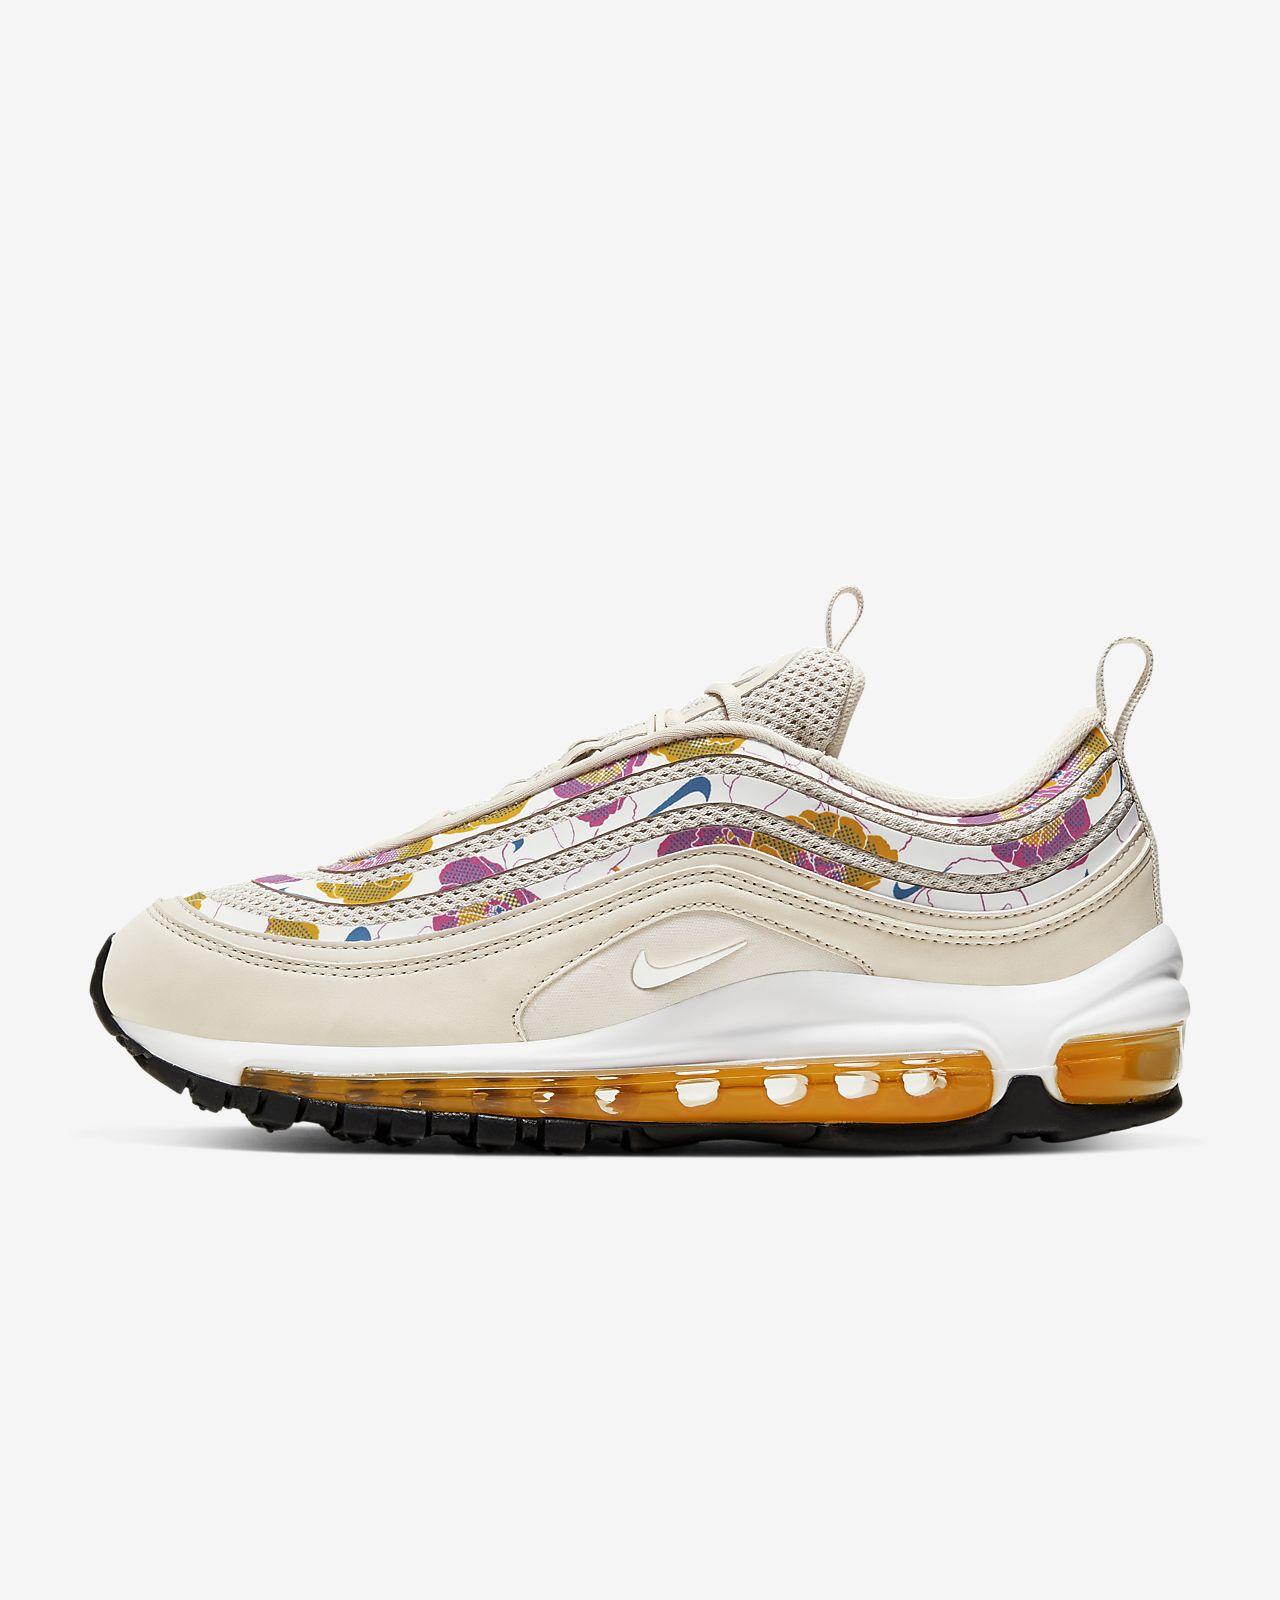 Nike Air Max 97 SE女子运动鞋